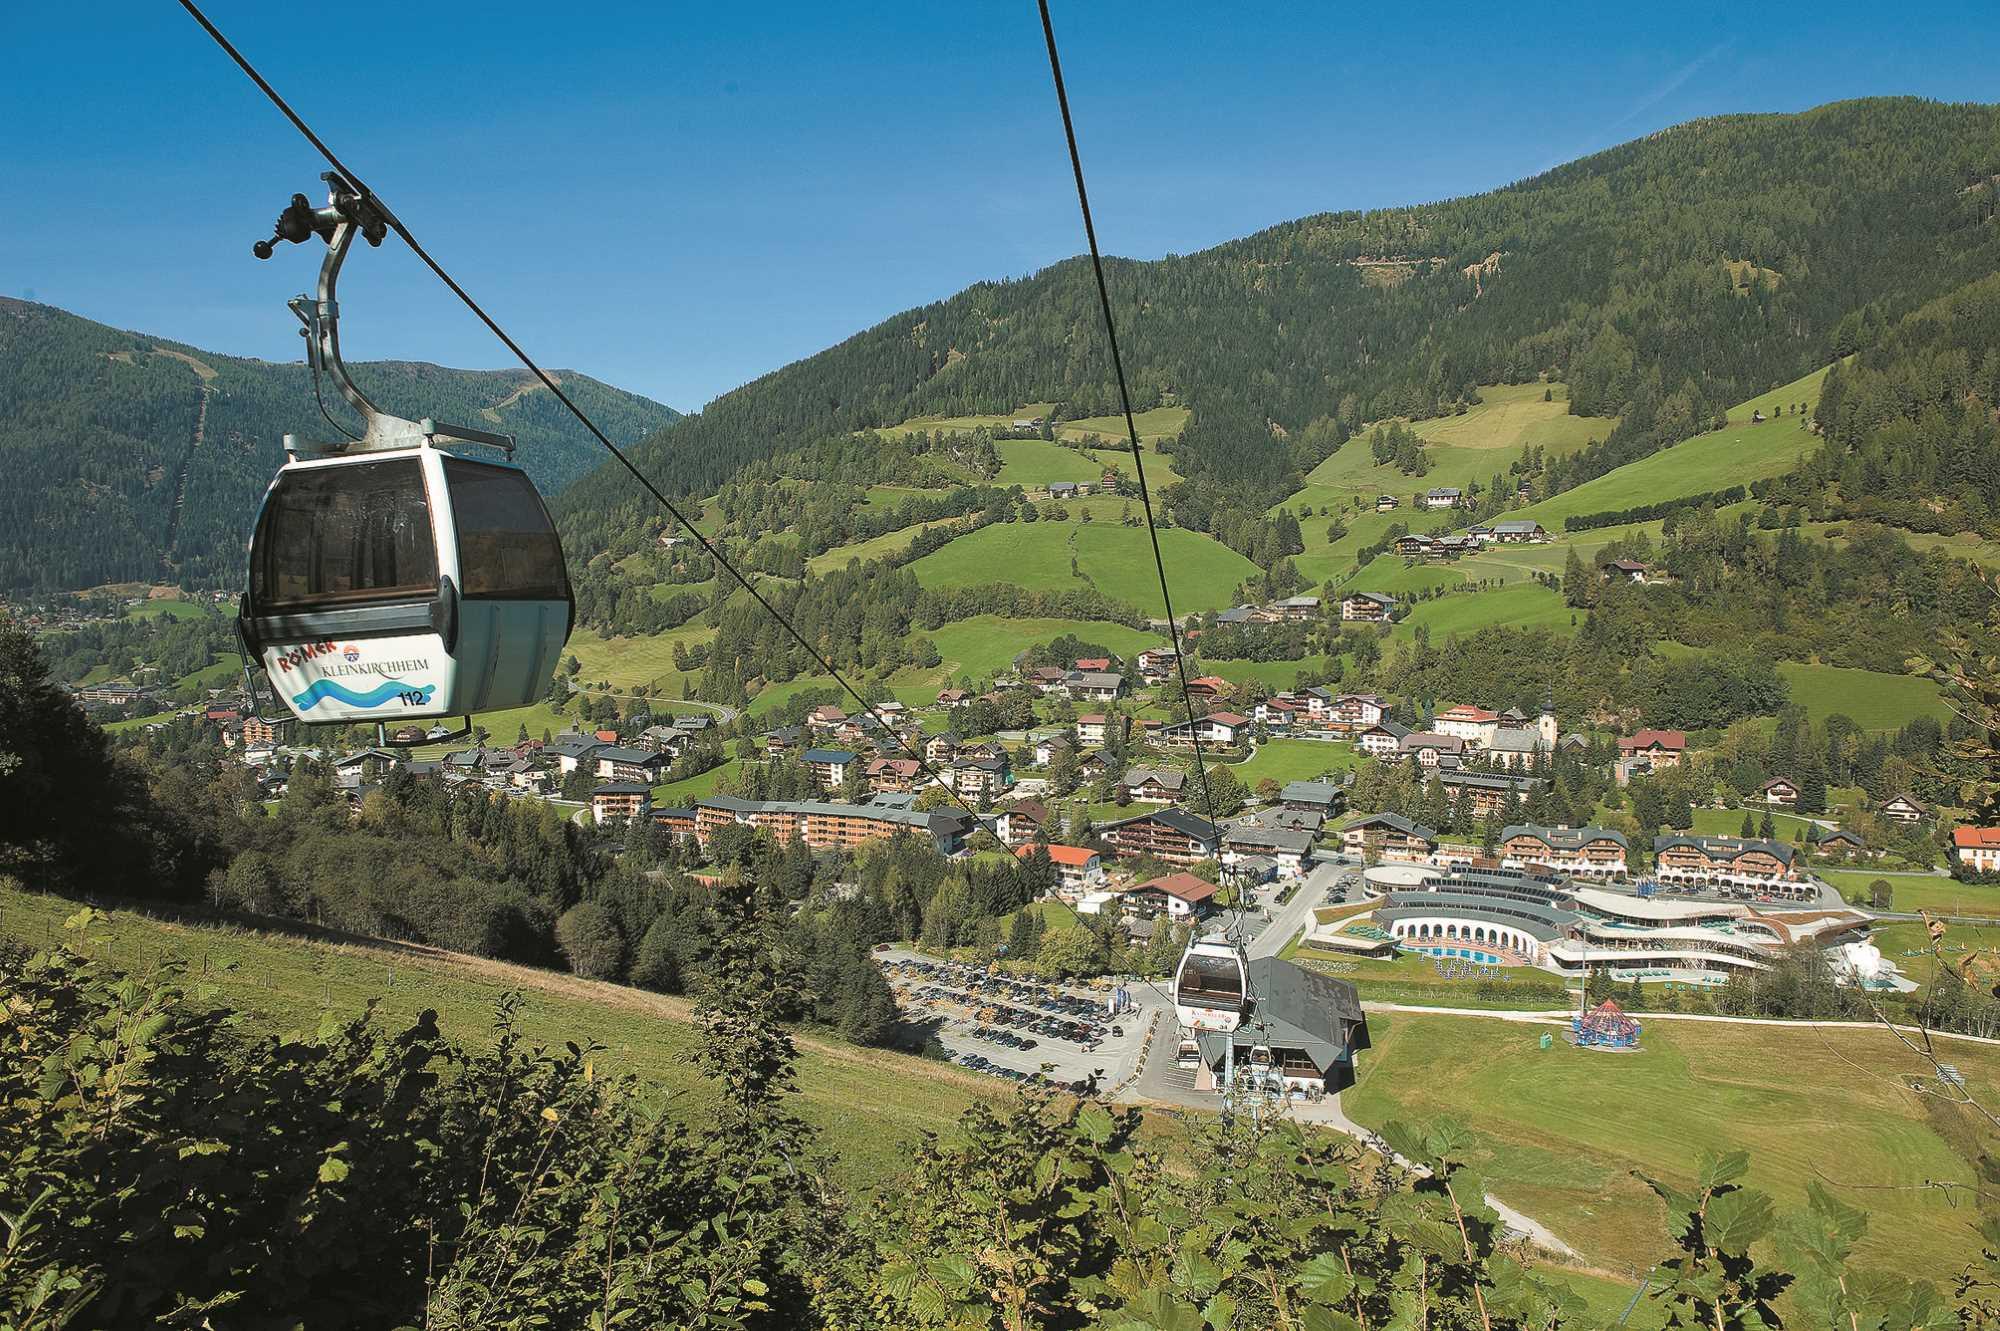 Bad_kleinkirchheim_zomer_lift (Aangepast)